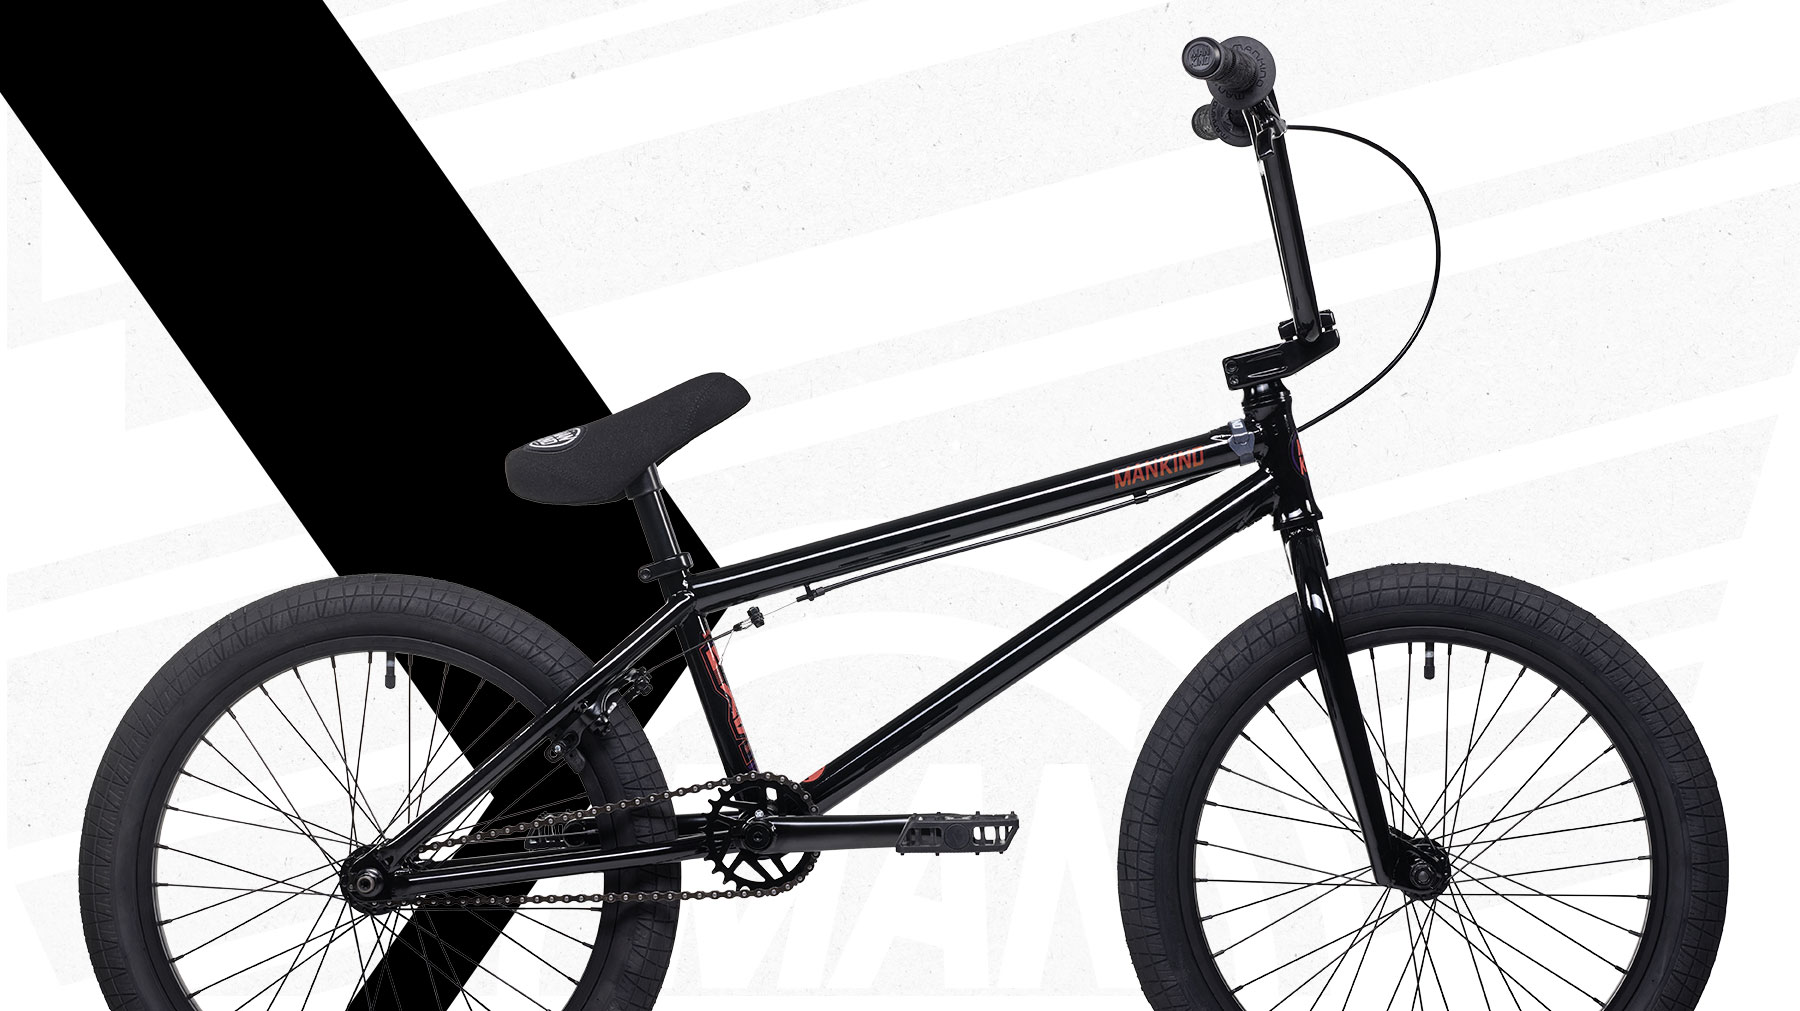 2020 NXS XL 20″ Gloss Black